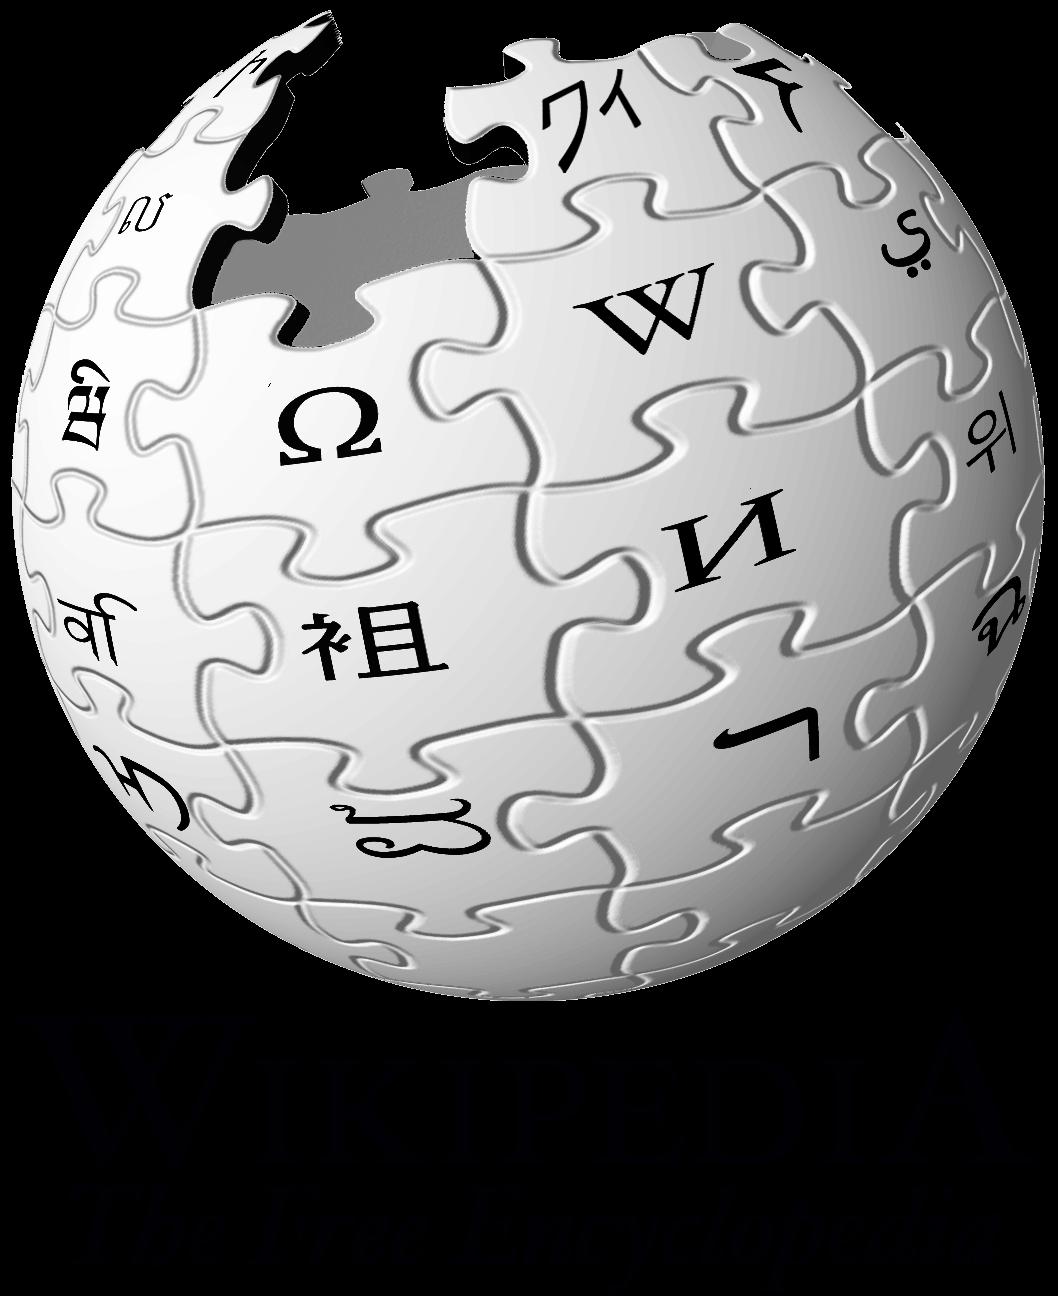 File:Wikipedia.